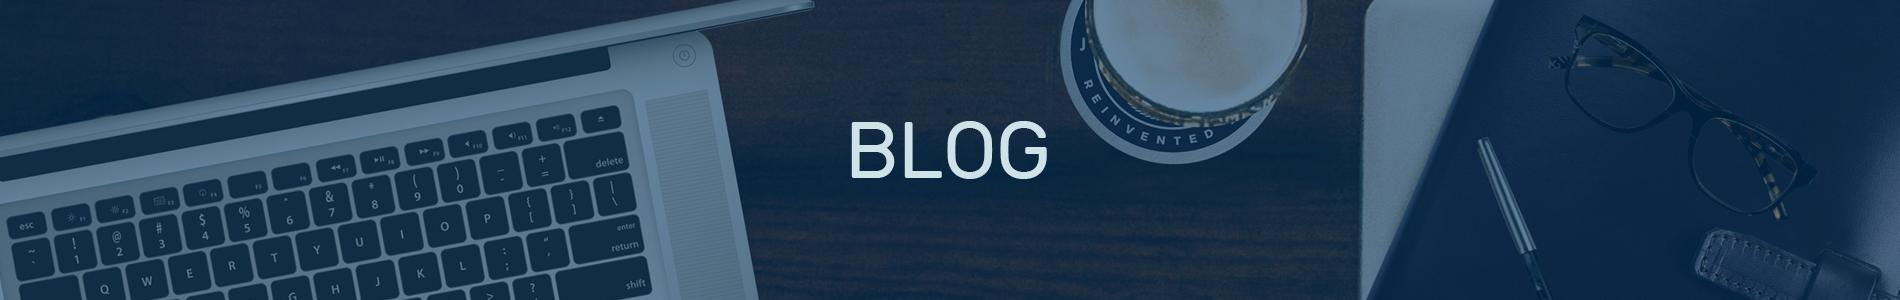 blog-banner1